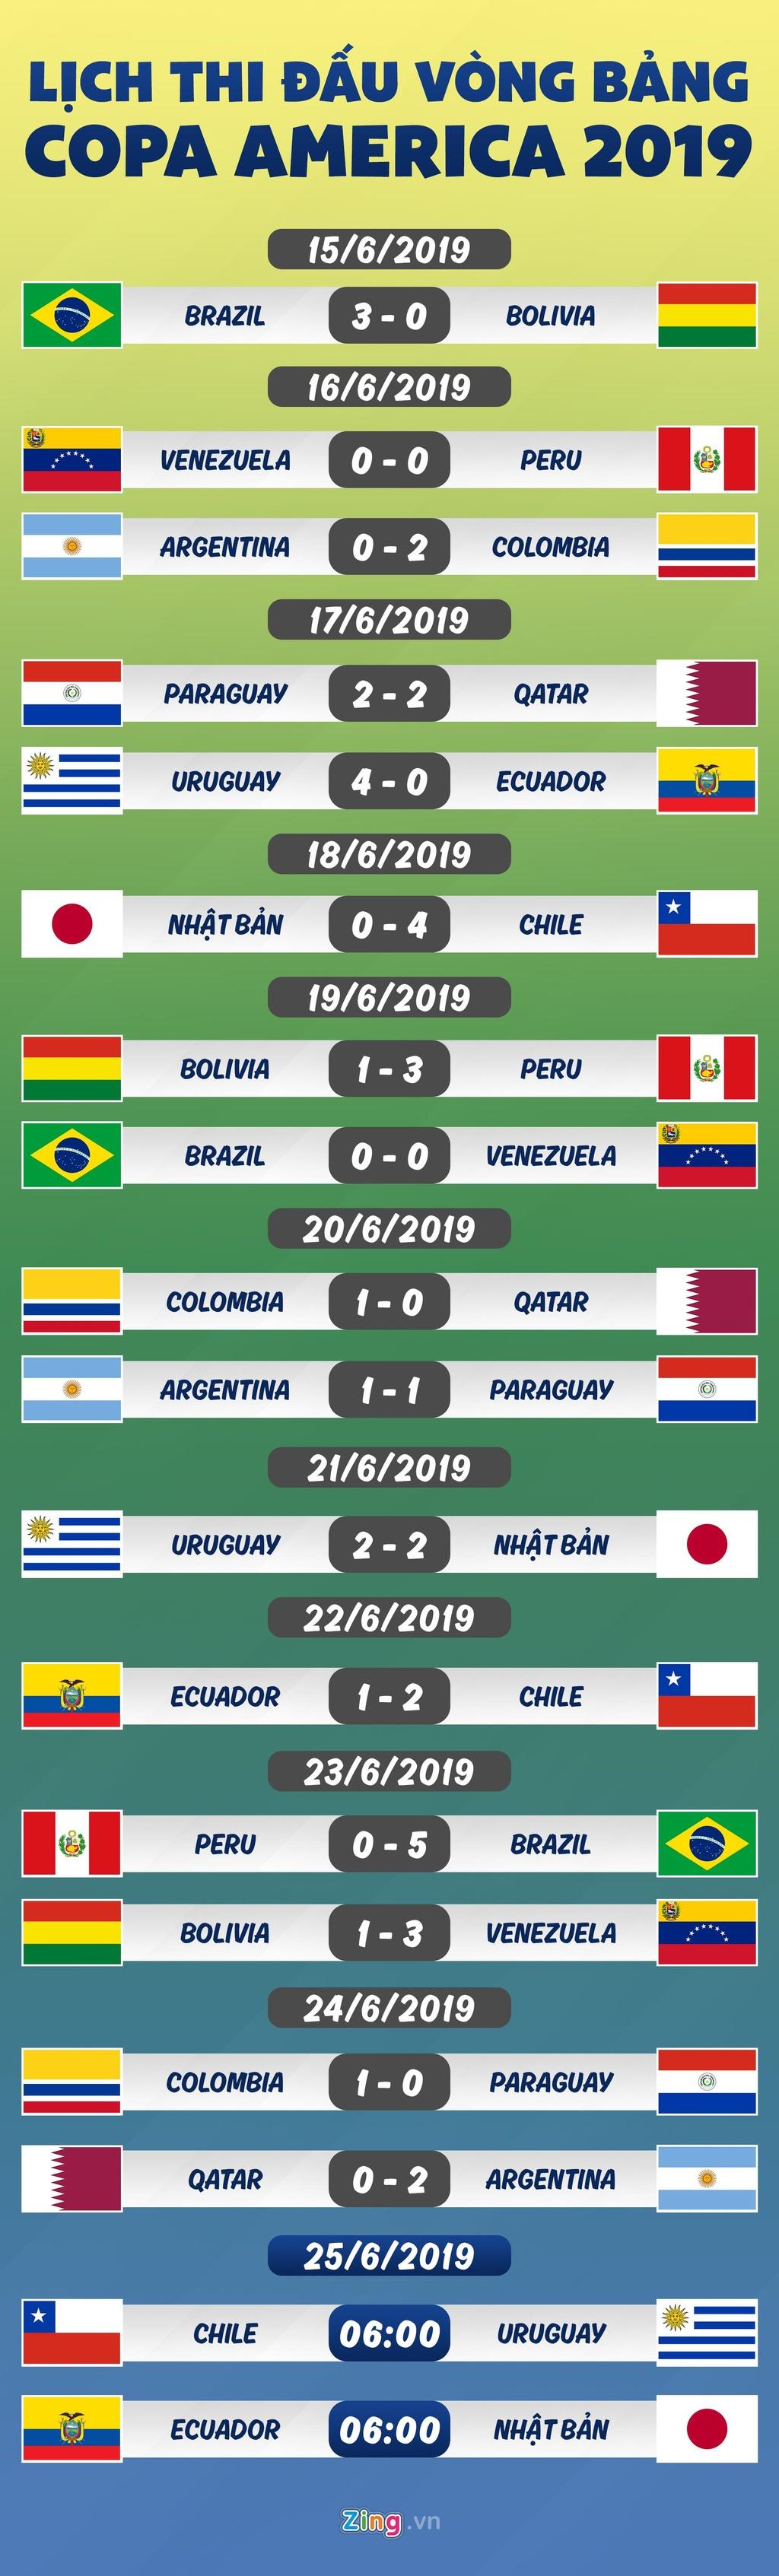 Lich thi dau Copa America: Nhat Ban buoc phai thang Ecuador hinh anh 1